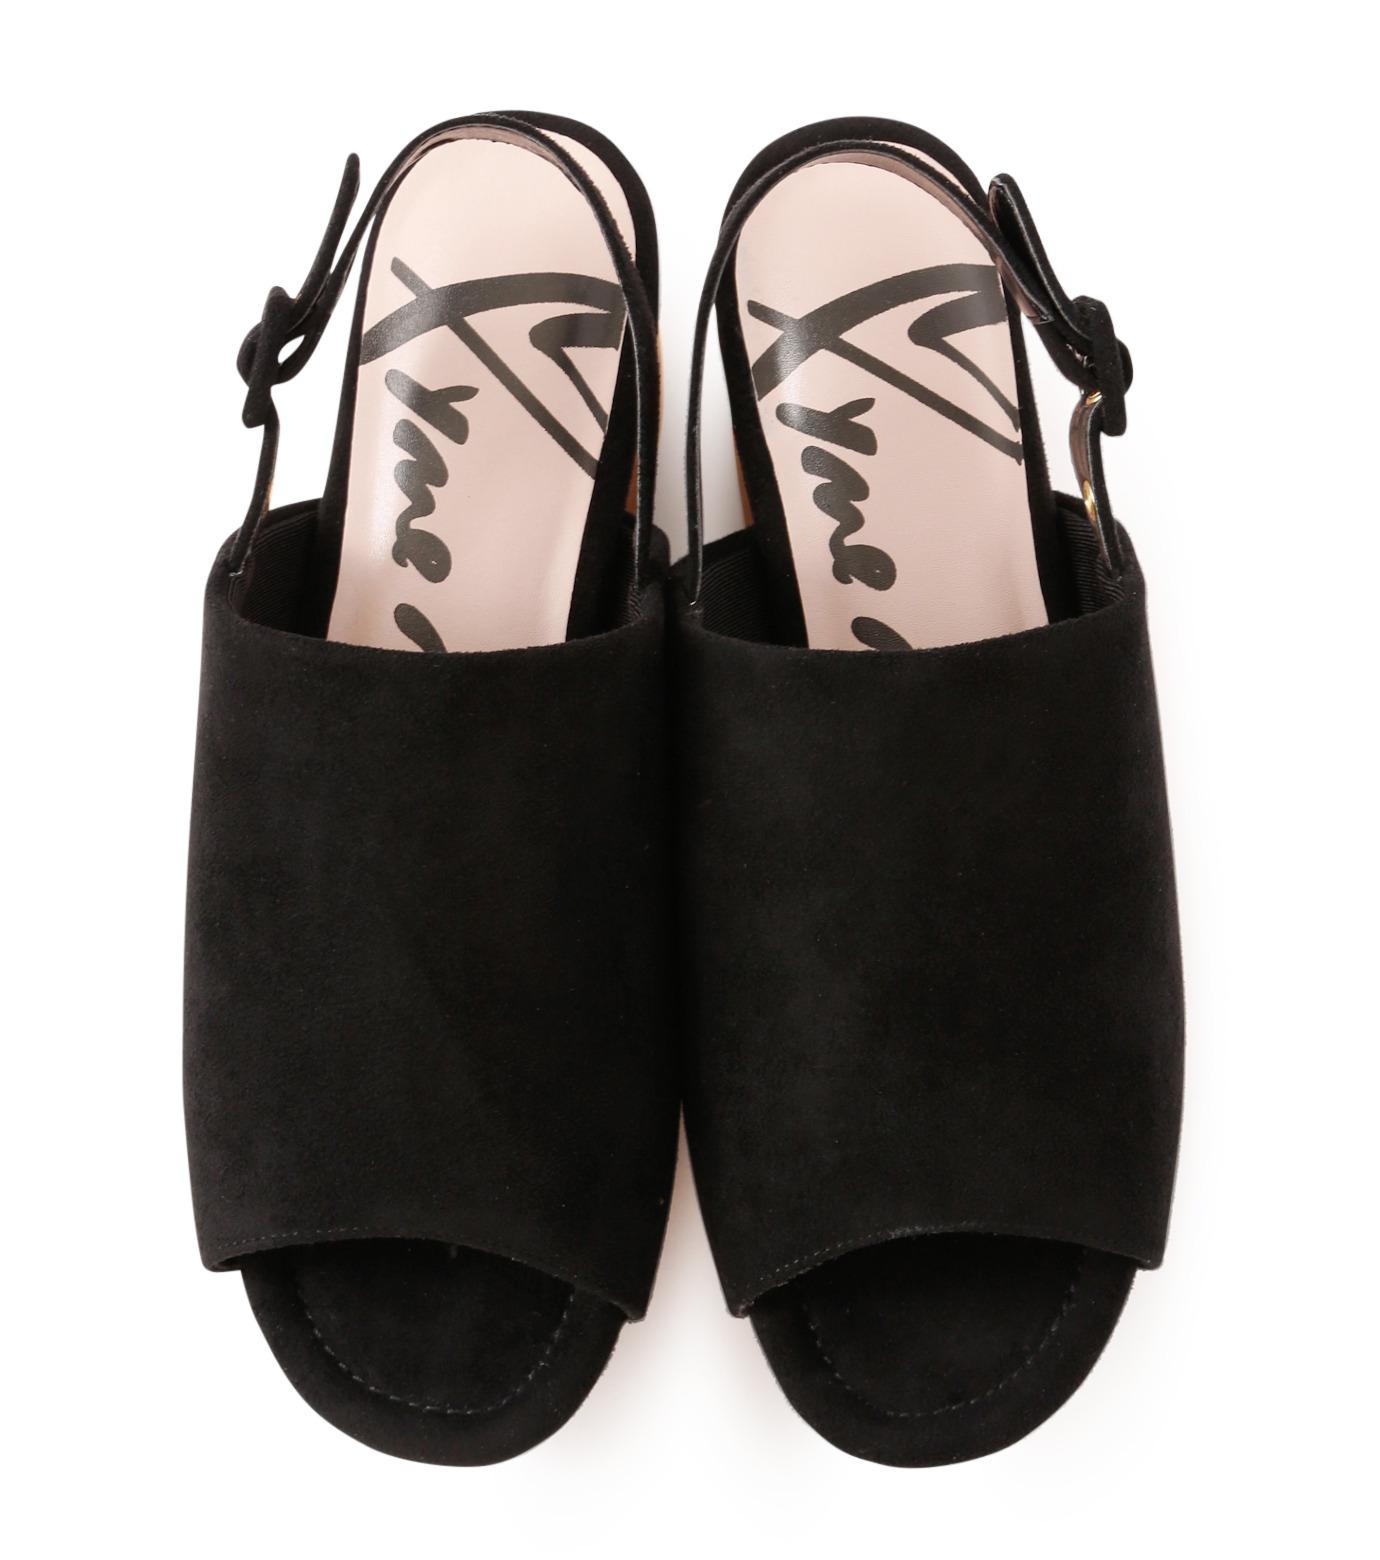 Myneself(マインセルフ)のFake Suede Sandal-BLACK(フラットシューズ/Flat shoes)-MSS7-0010-13 拡大詳細画像4